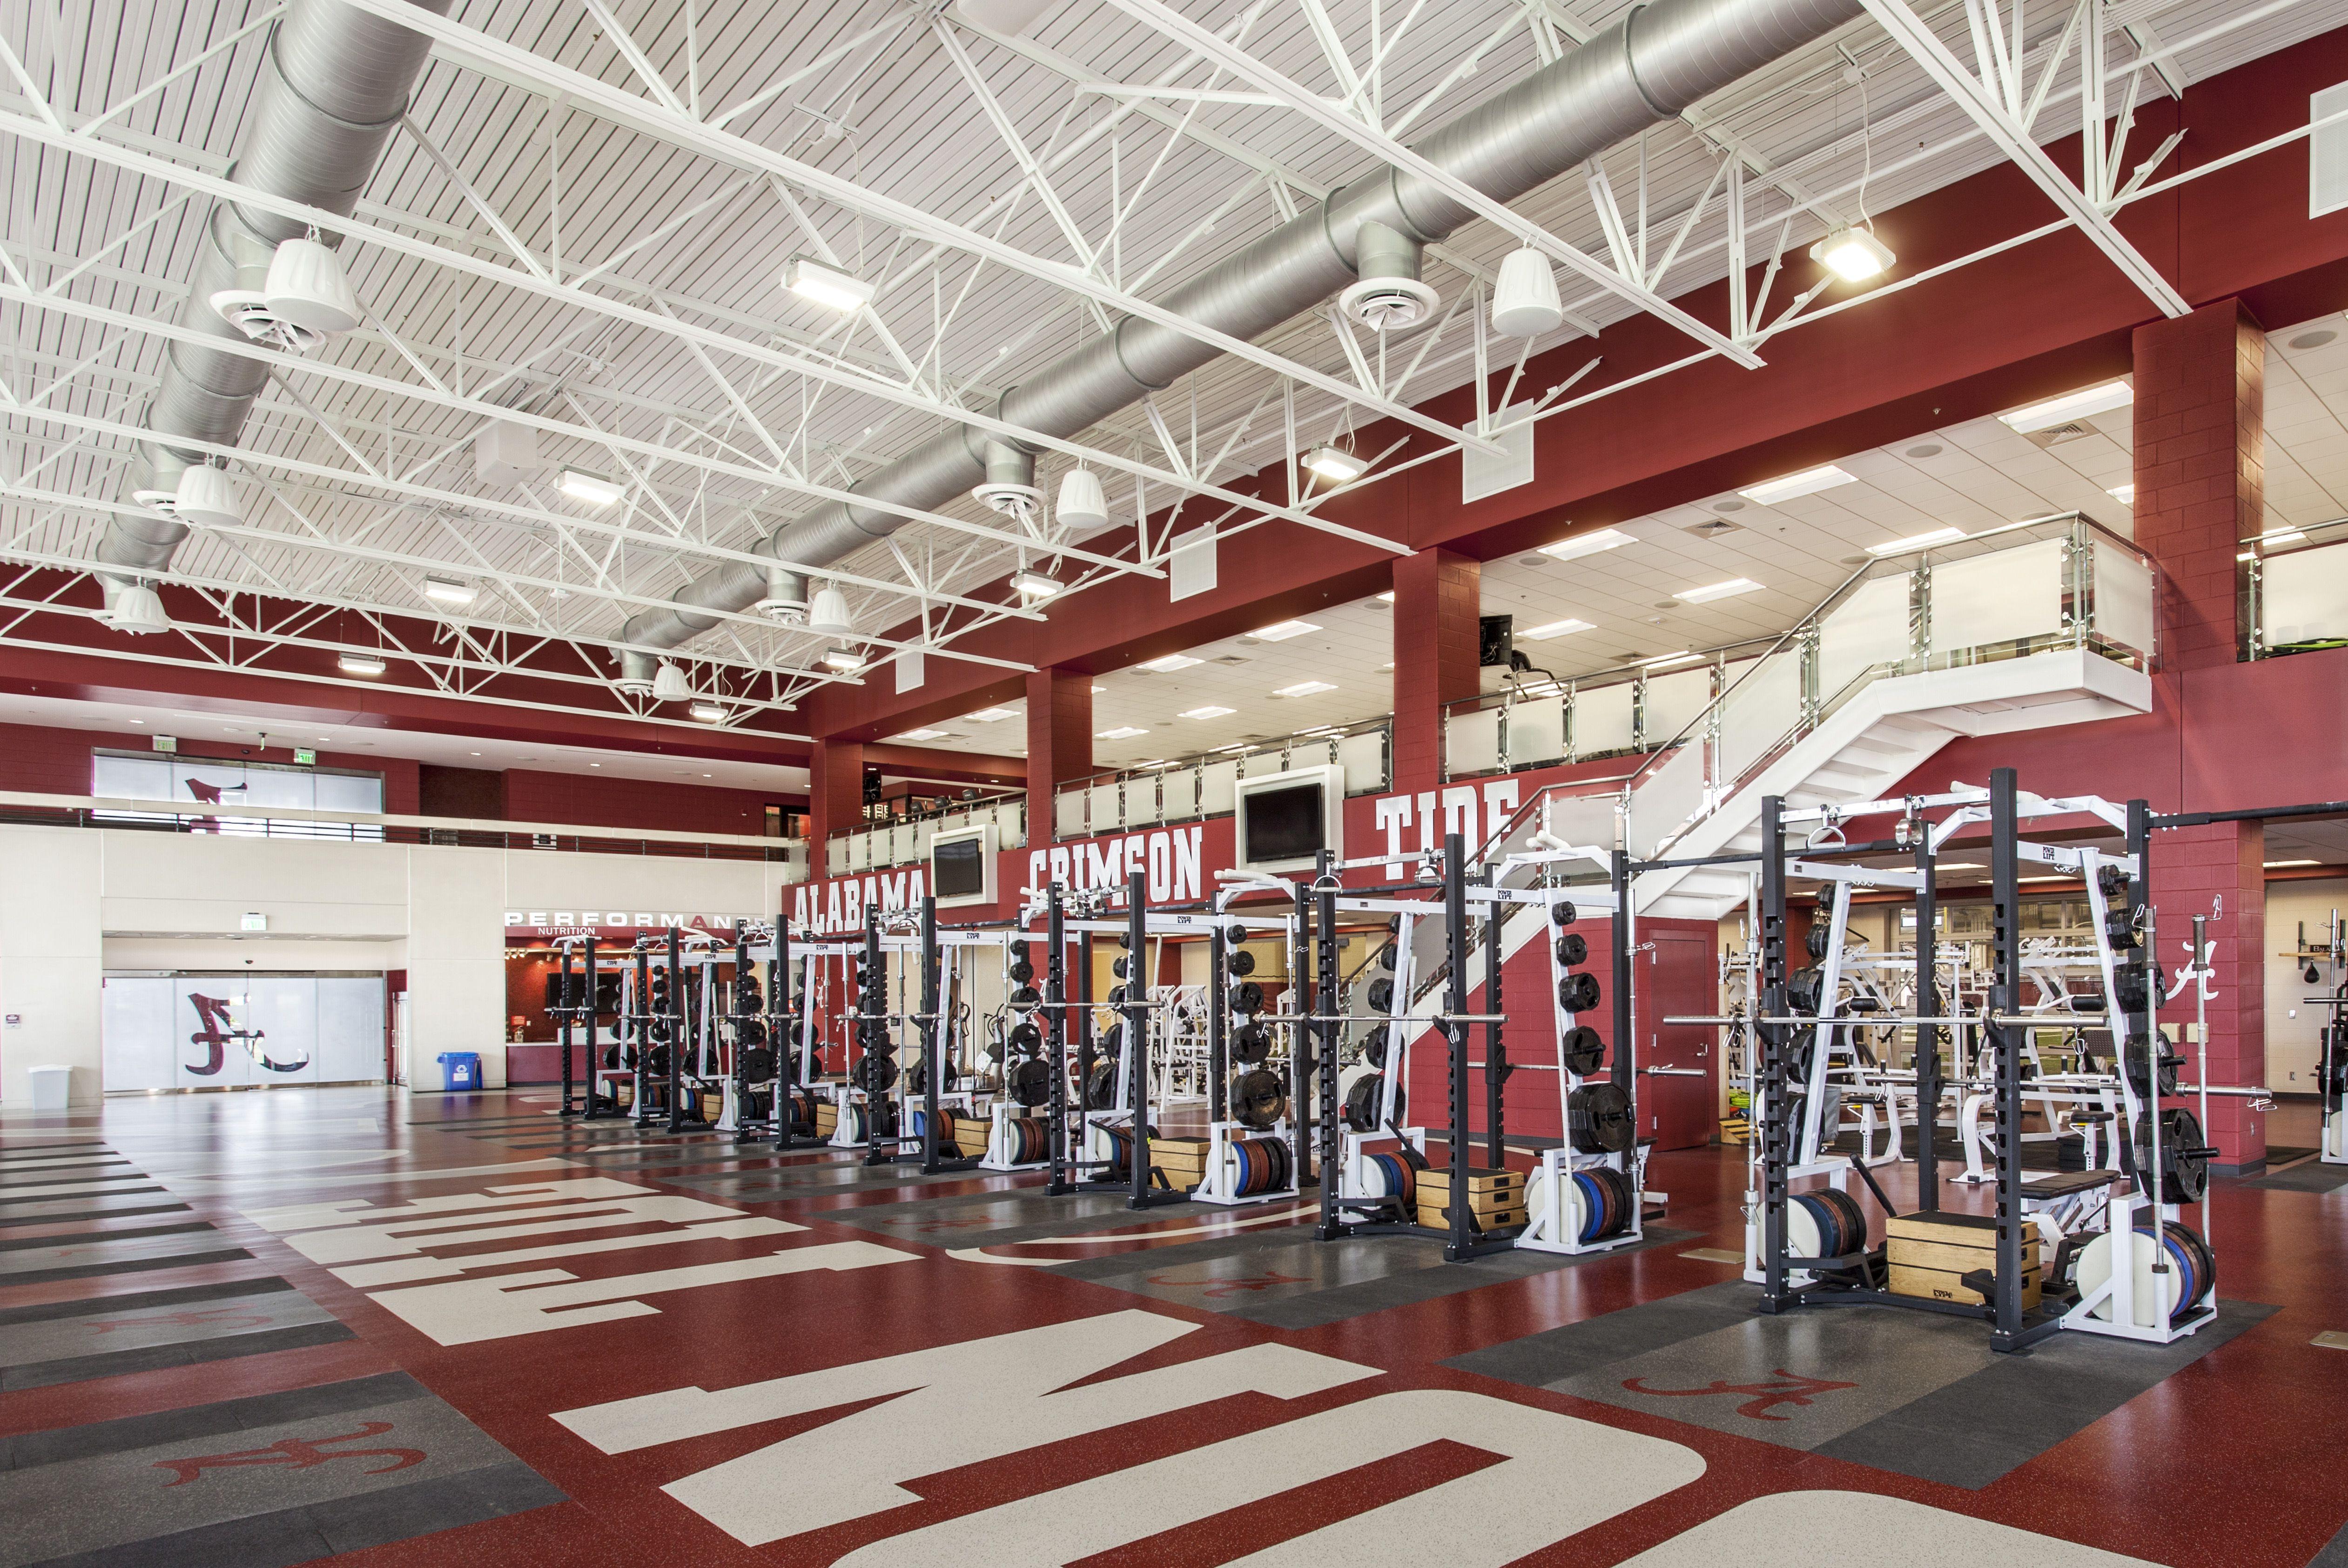 University Of Alabama Football Weightroom Stadium Design Education Design Sports Design